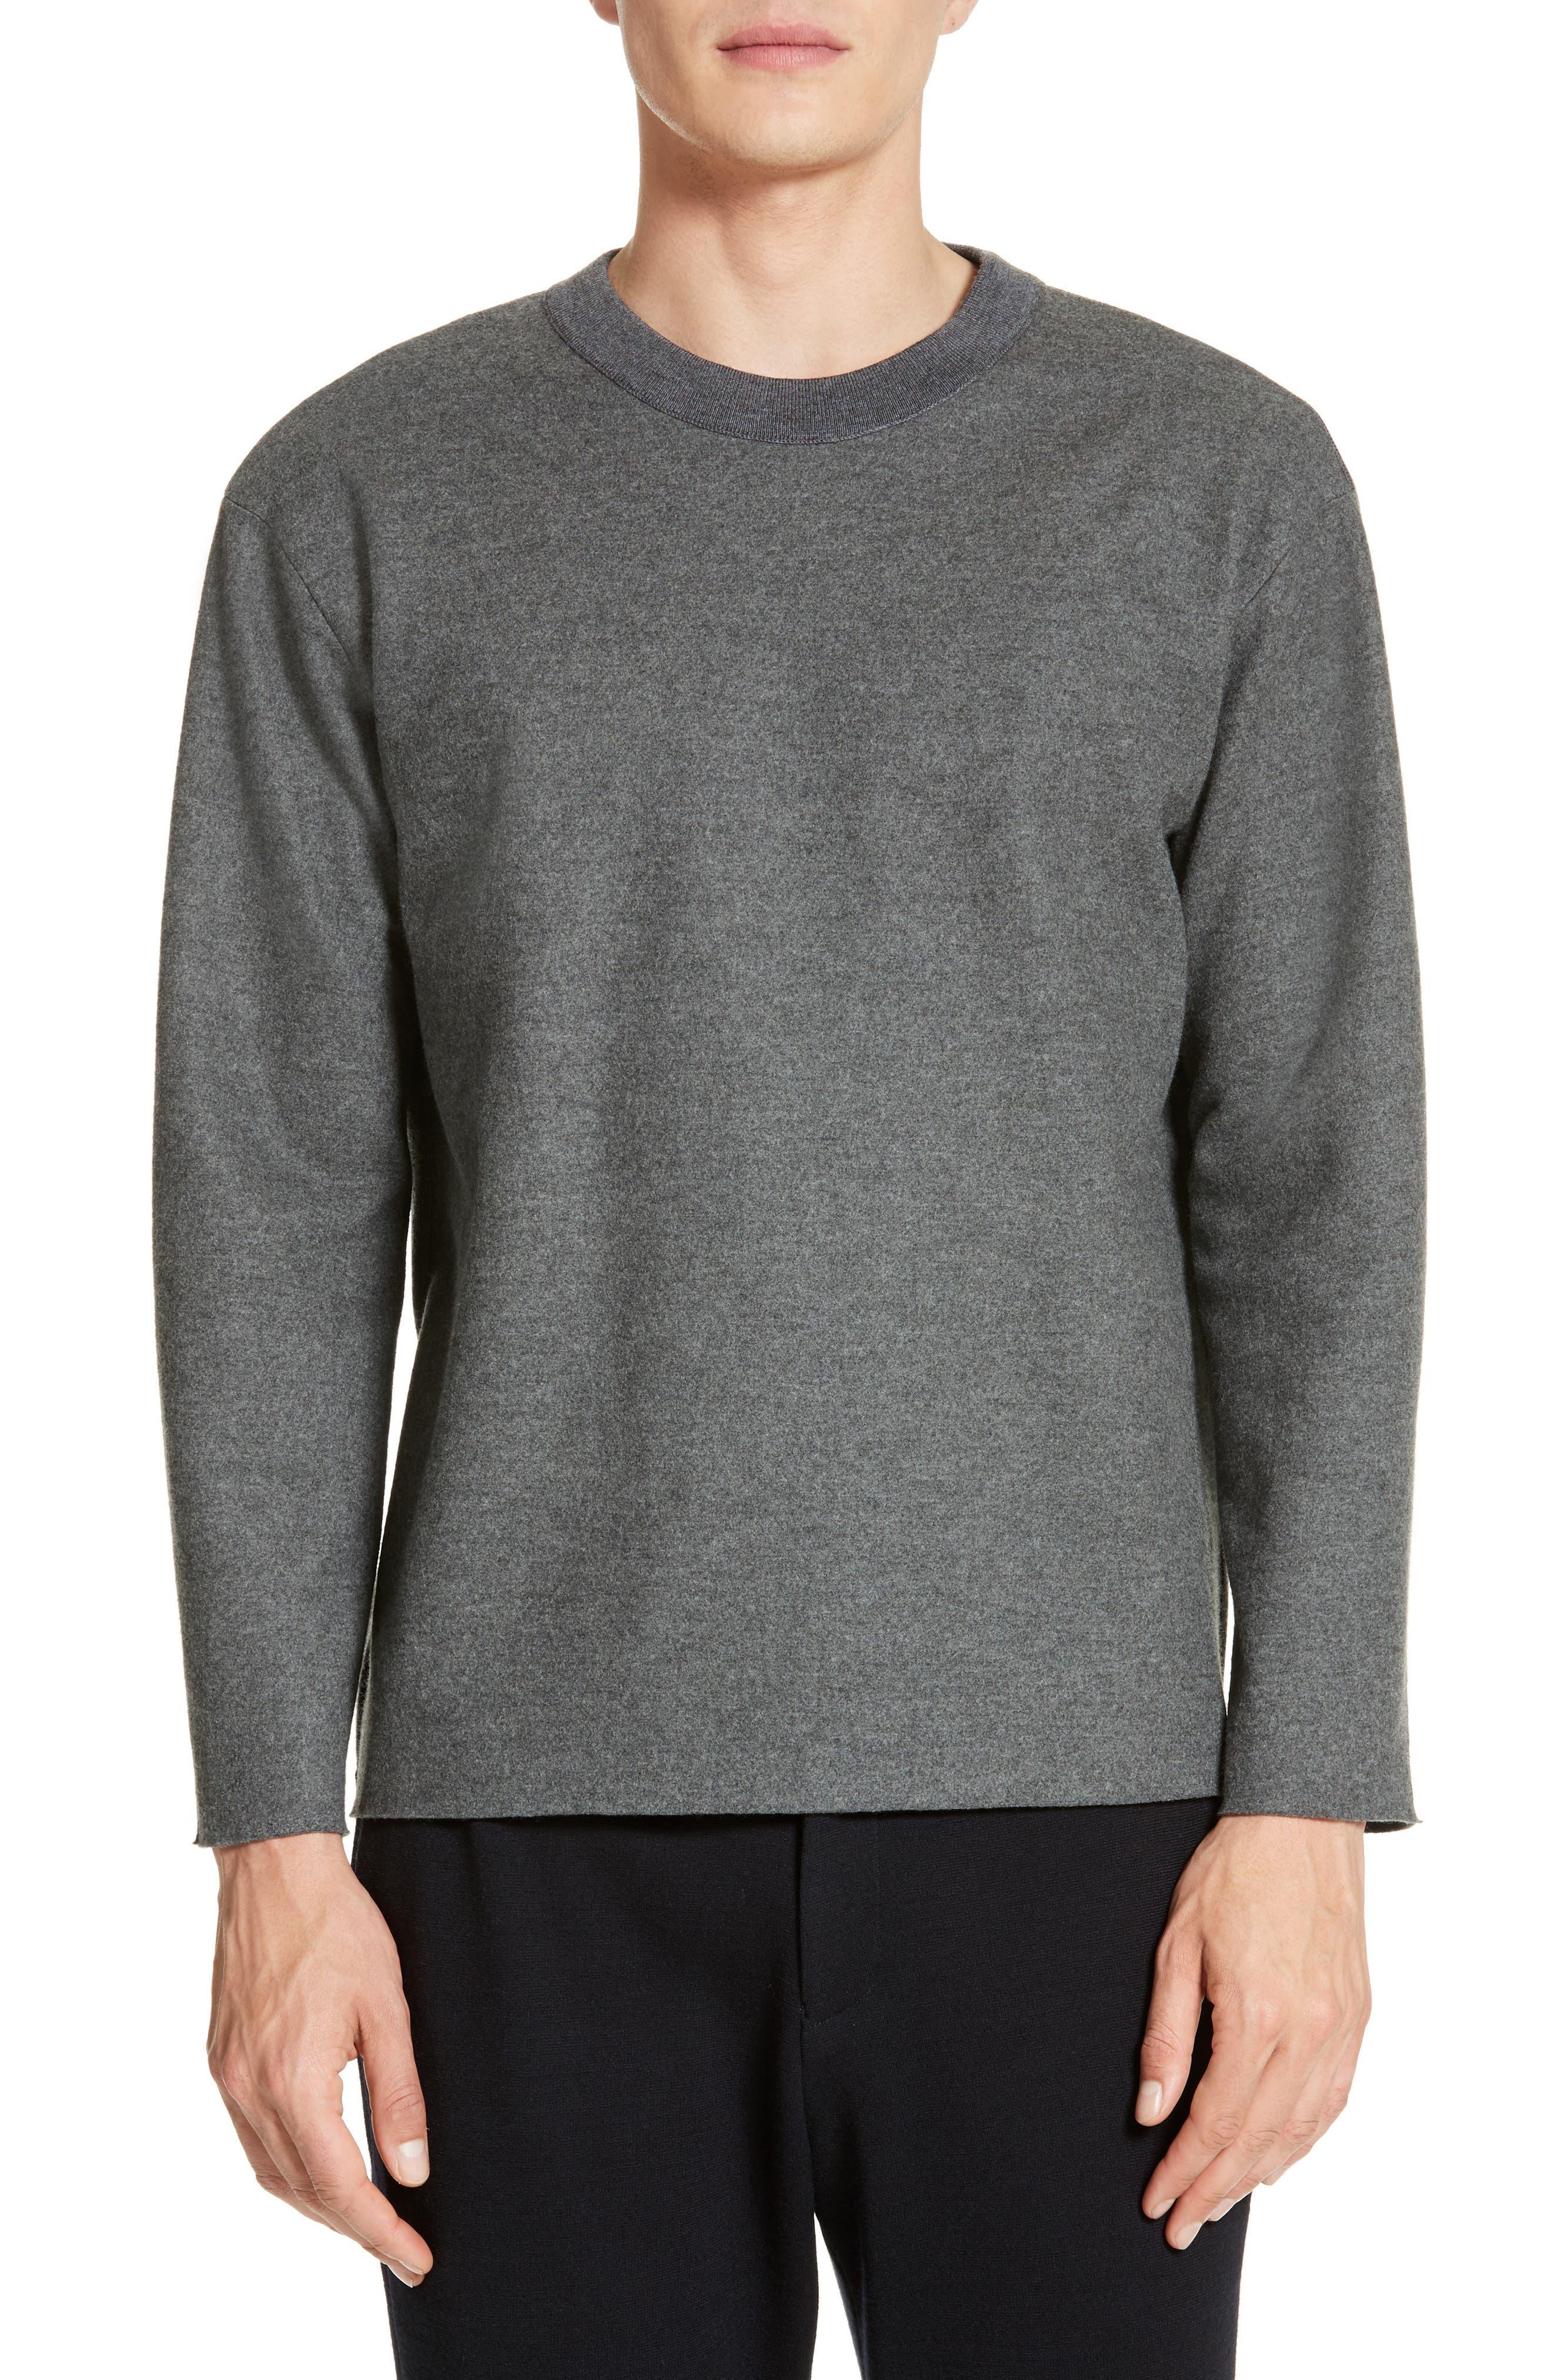 Hyper Compress Sweatshirt,                         Main,                         color,